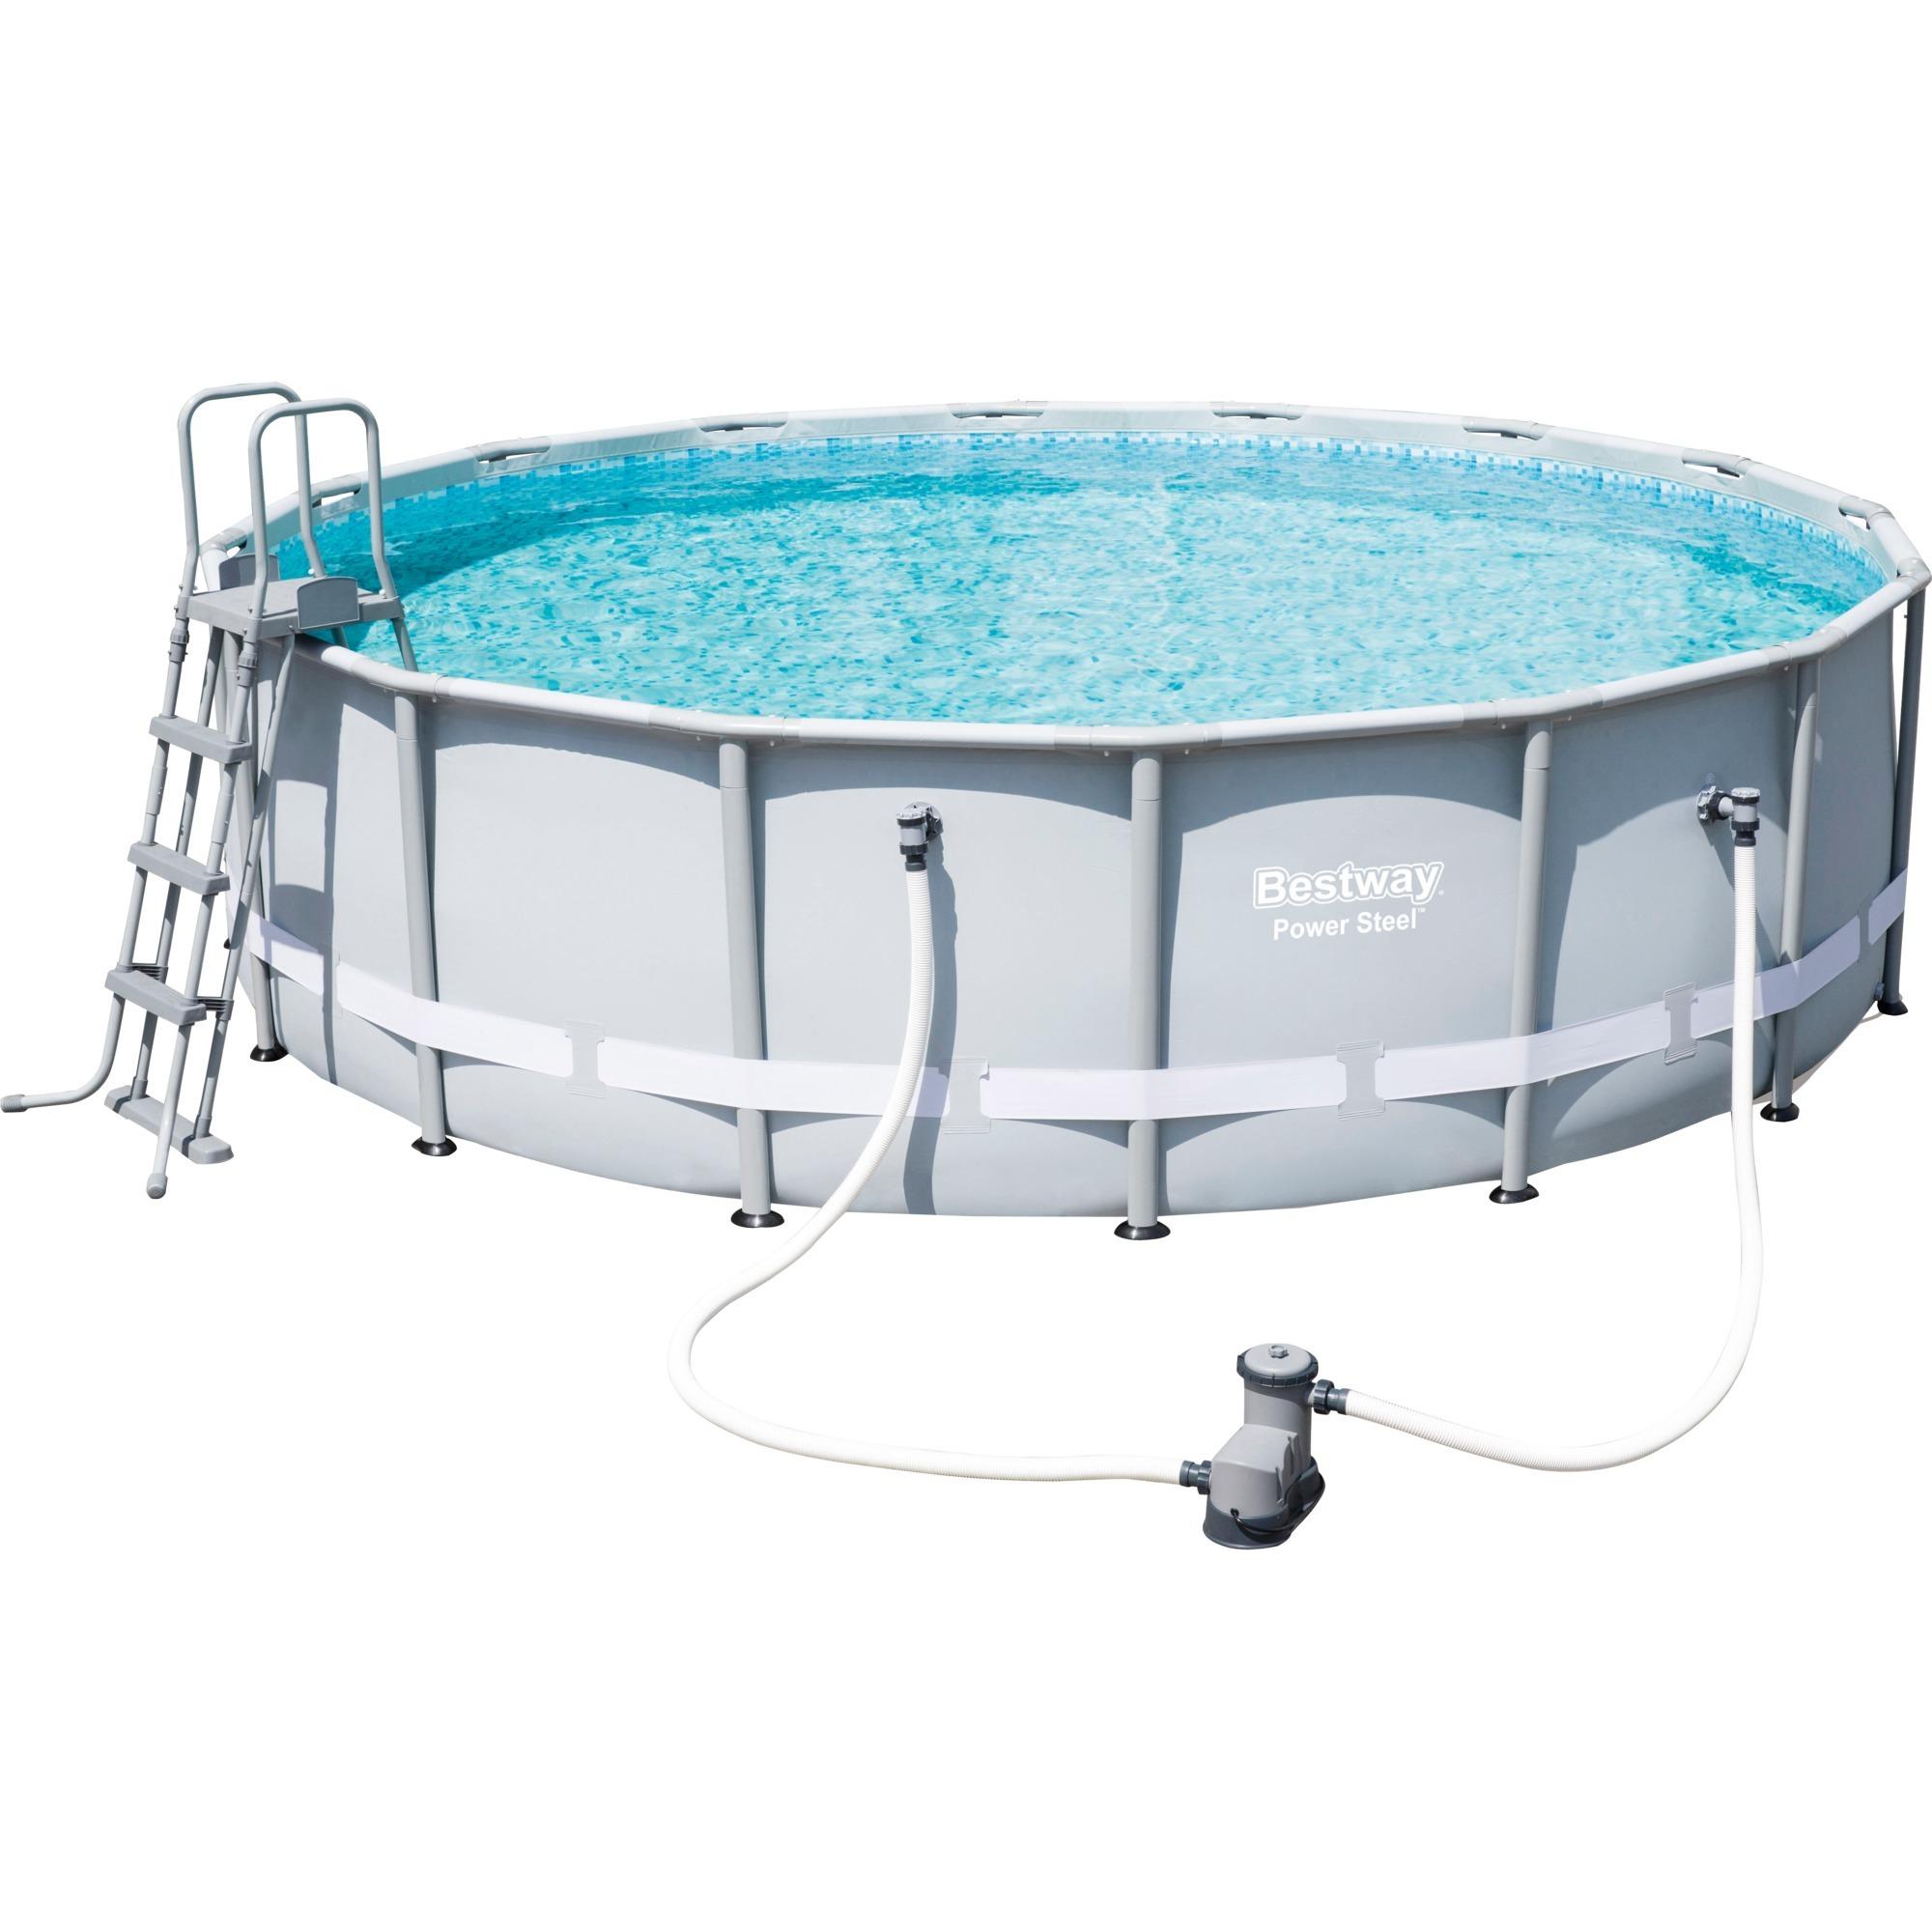 power-steel-56451-framed-pool-round-pool-19480l-blaa-graa-swimmingpool-til-over-jorden-swimming-pool